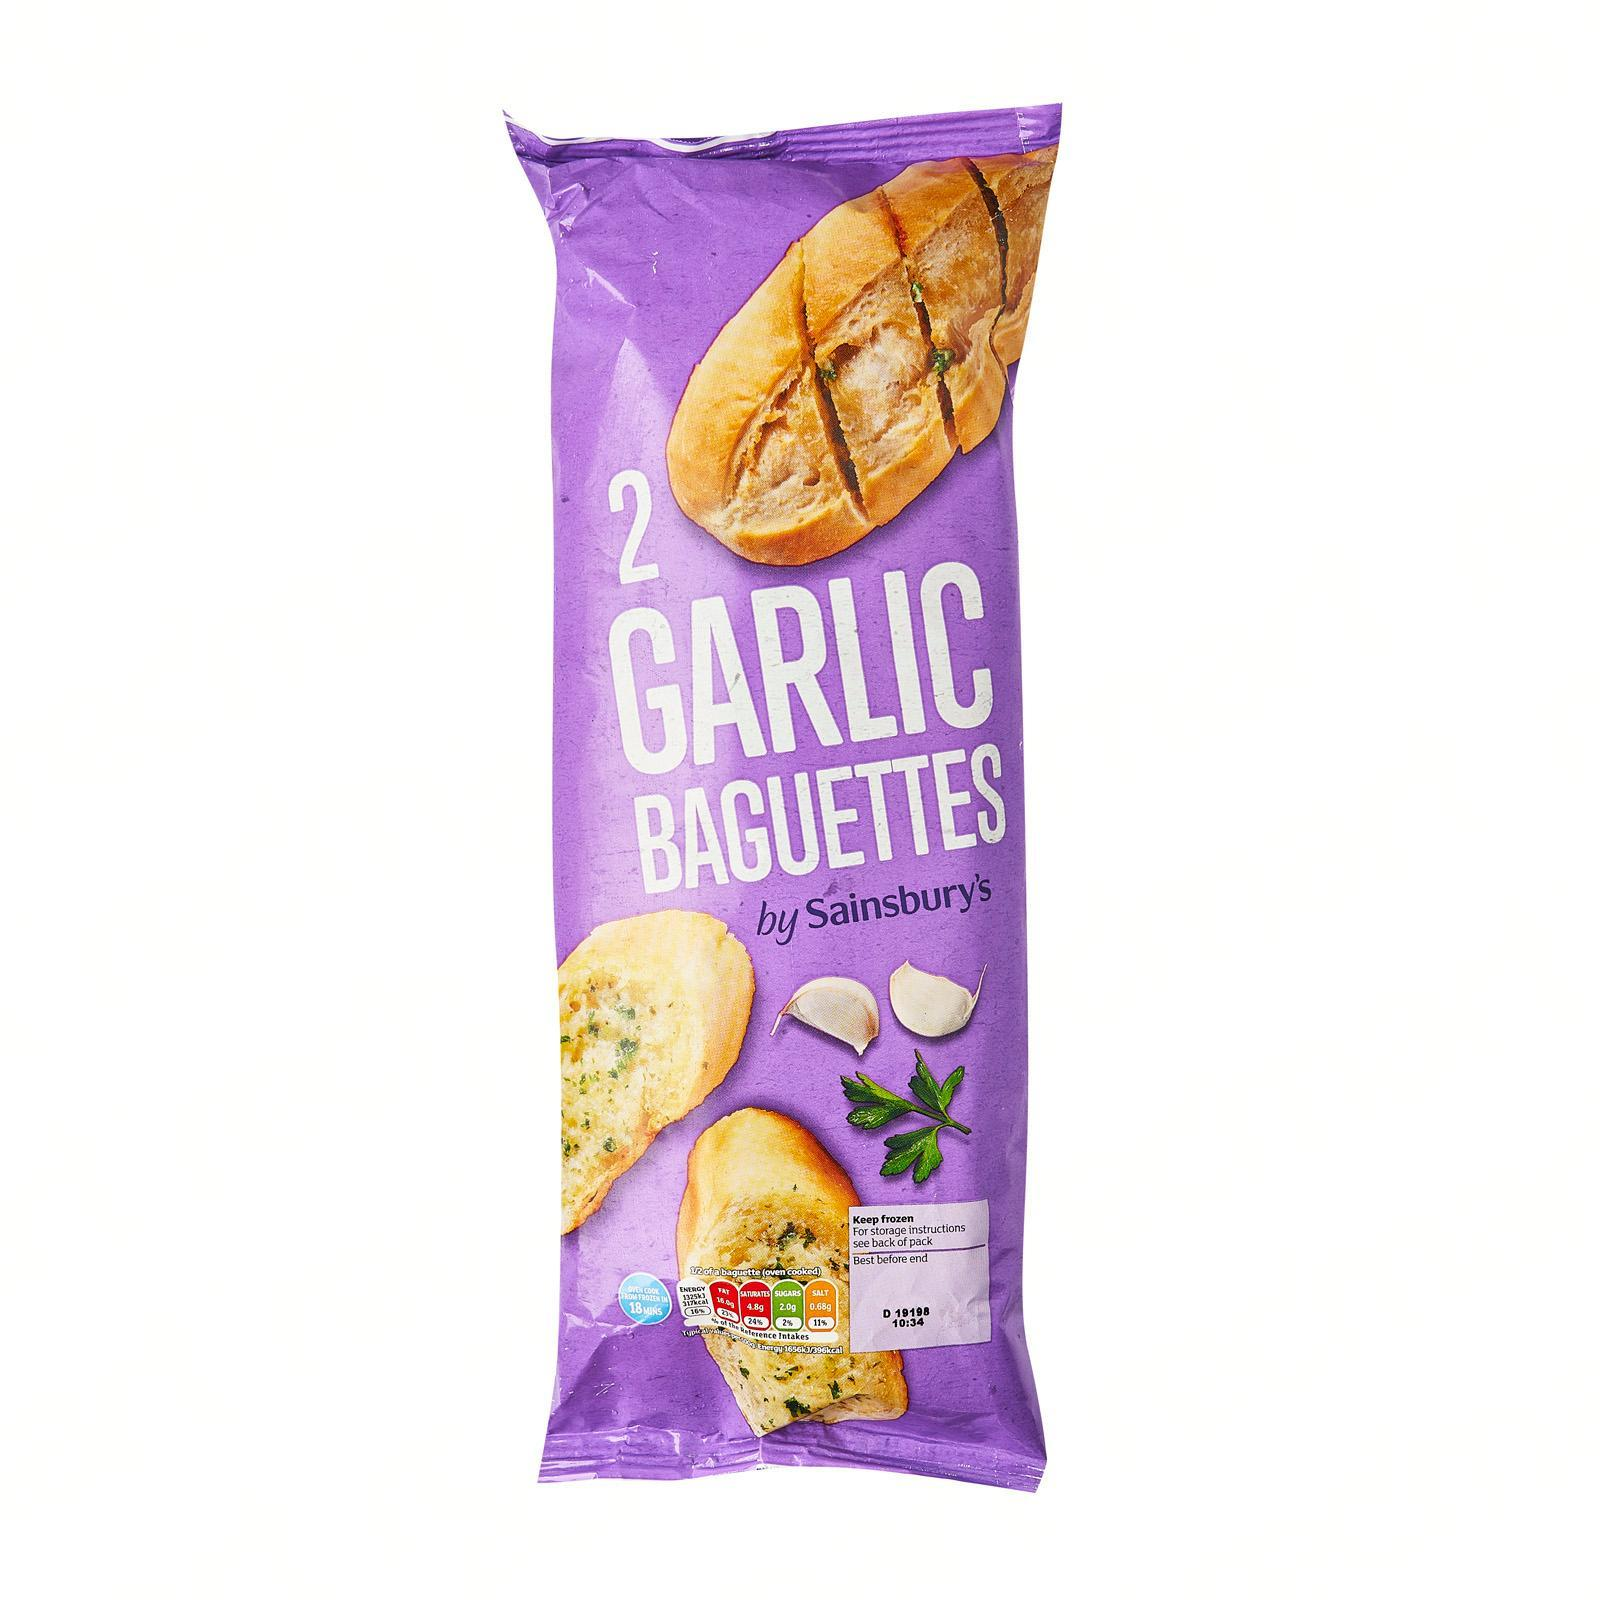 Sainsbury's Garlic Baguette - Frozen